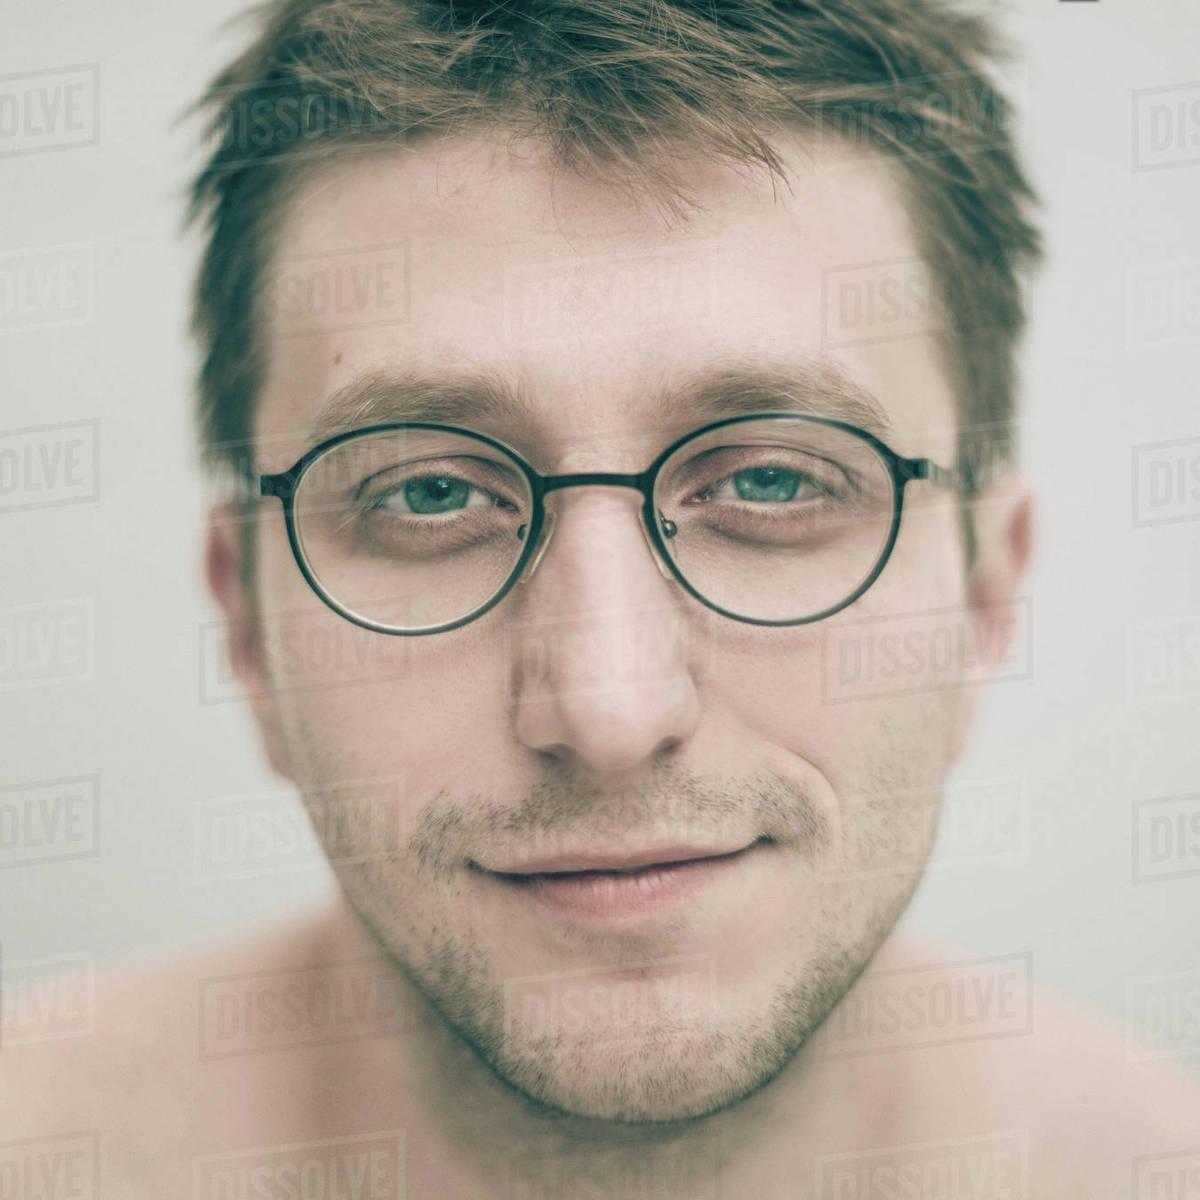 b804d5ec29d Portrait of smiling Caucasian man wearing eyeglasses - Stock Photo ...